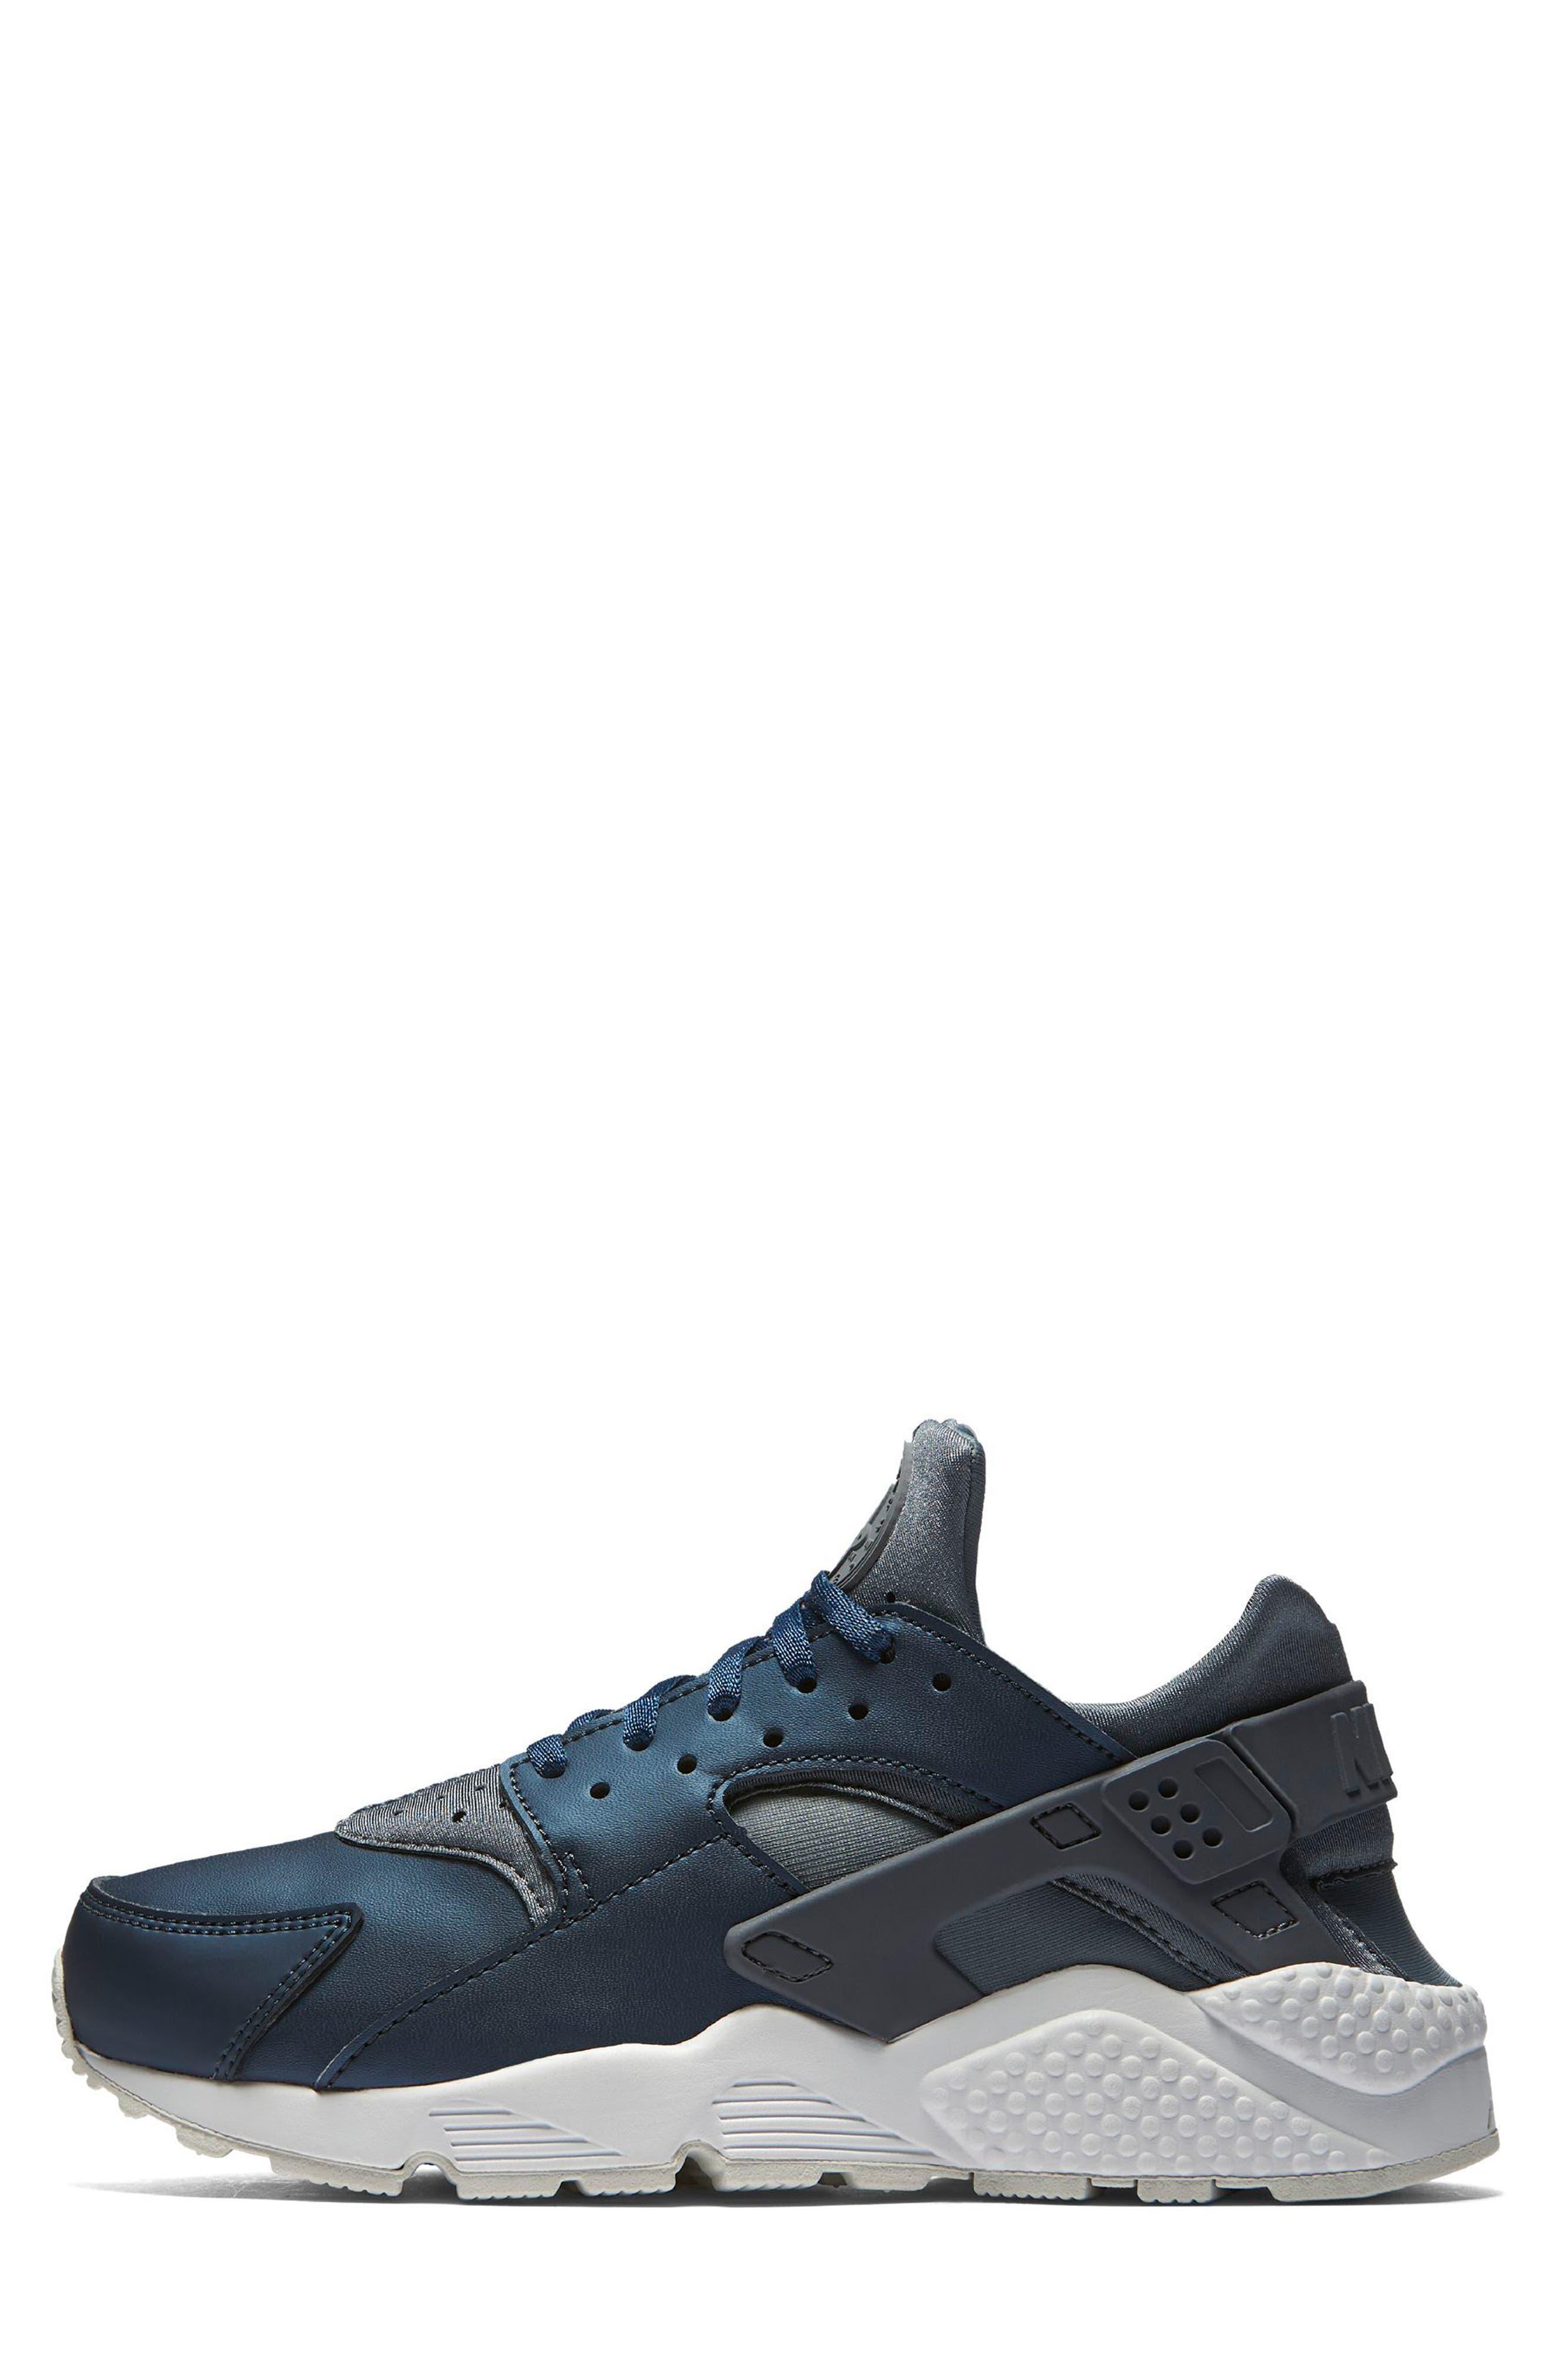 Alternate Image 3  - Nike Air Huarache Run Premium Sneaker (Women)